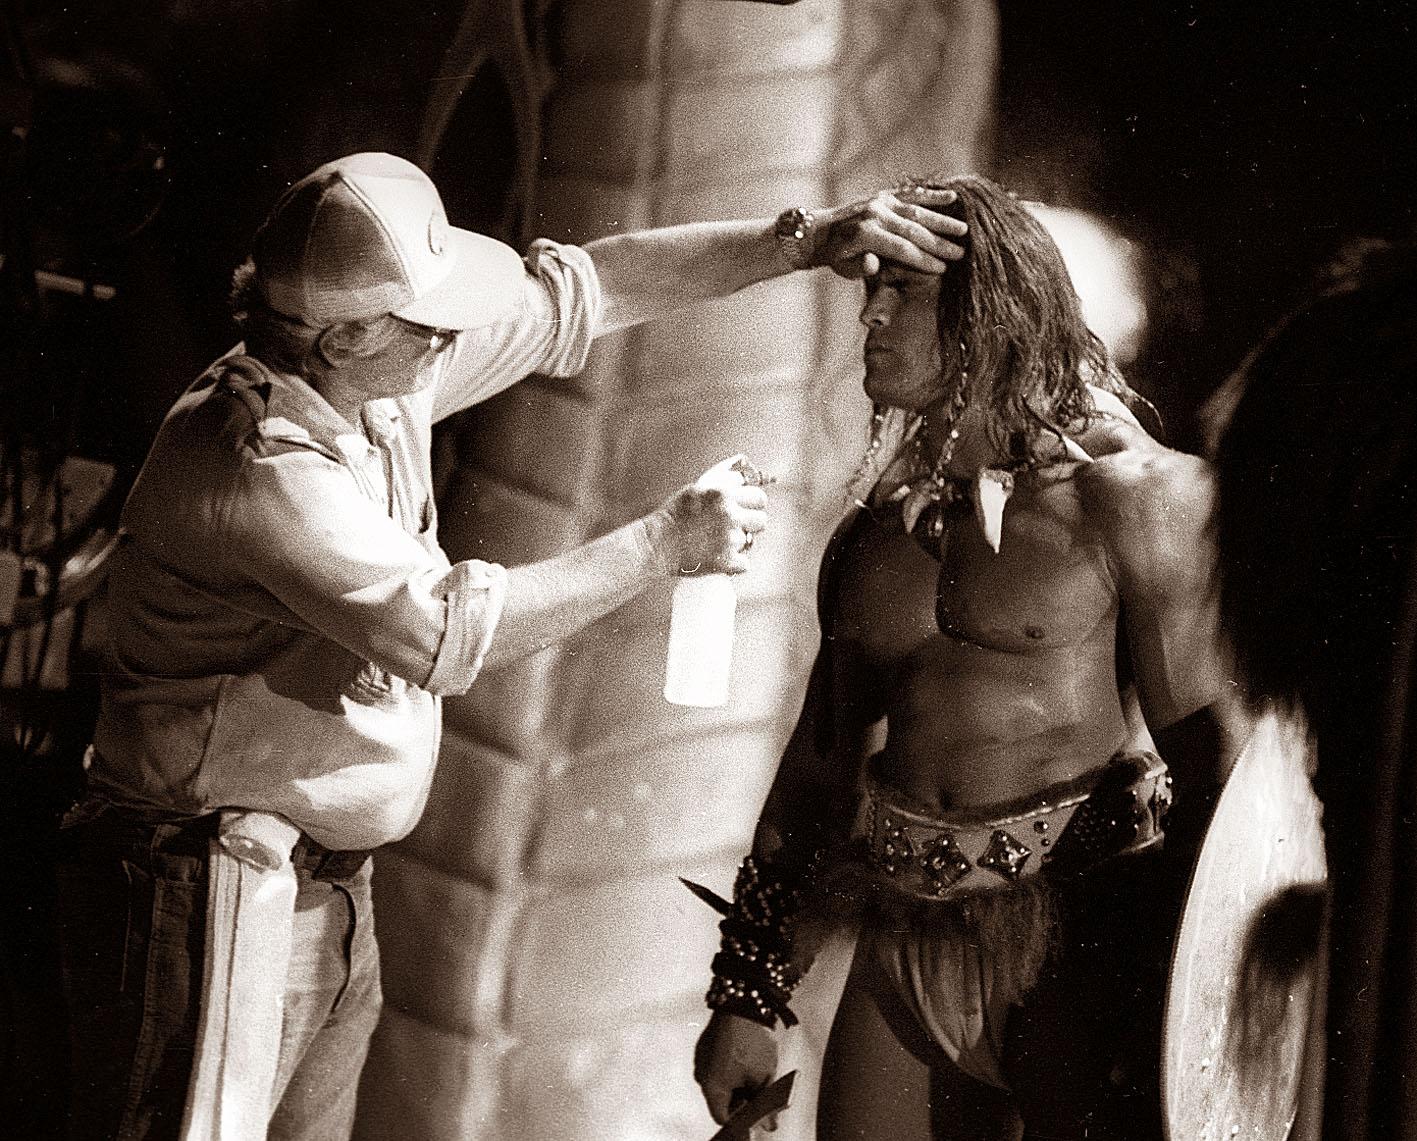 Conan 2 New Behind the Scenes Footage USA%2BUniversal%2BStudio%2BPromo%2BConan%2Bnr%2B2%2B1983_1